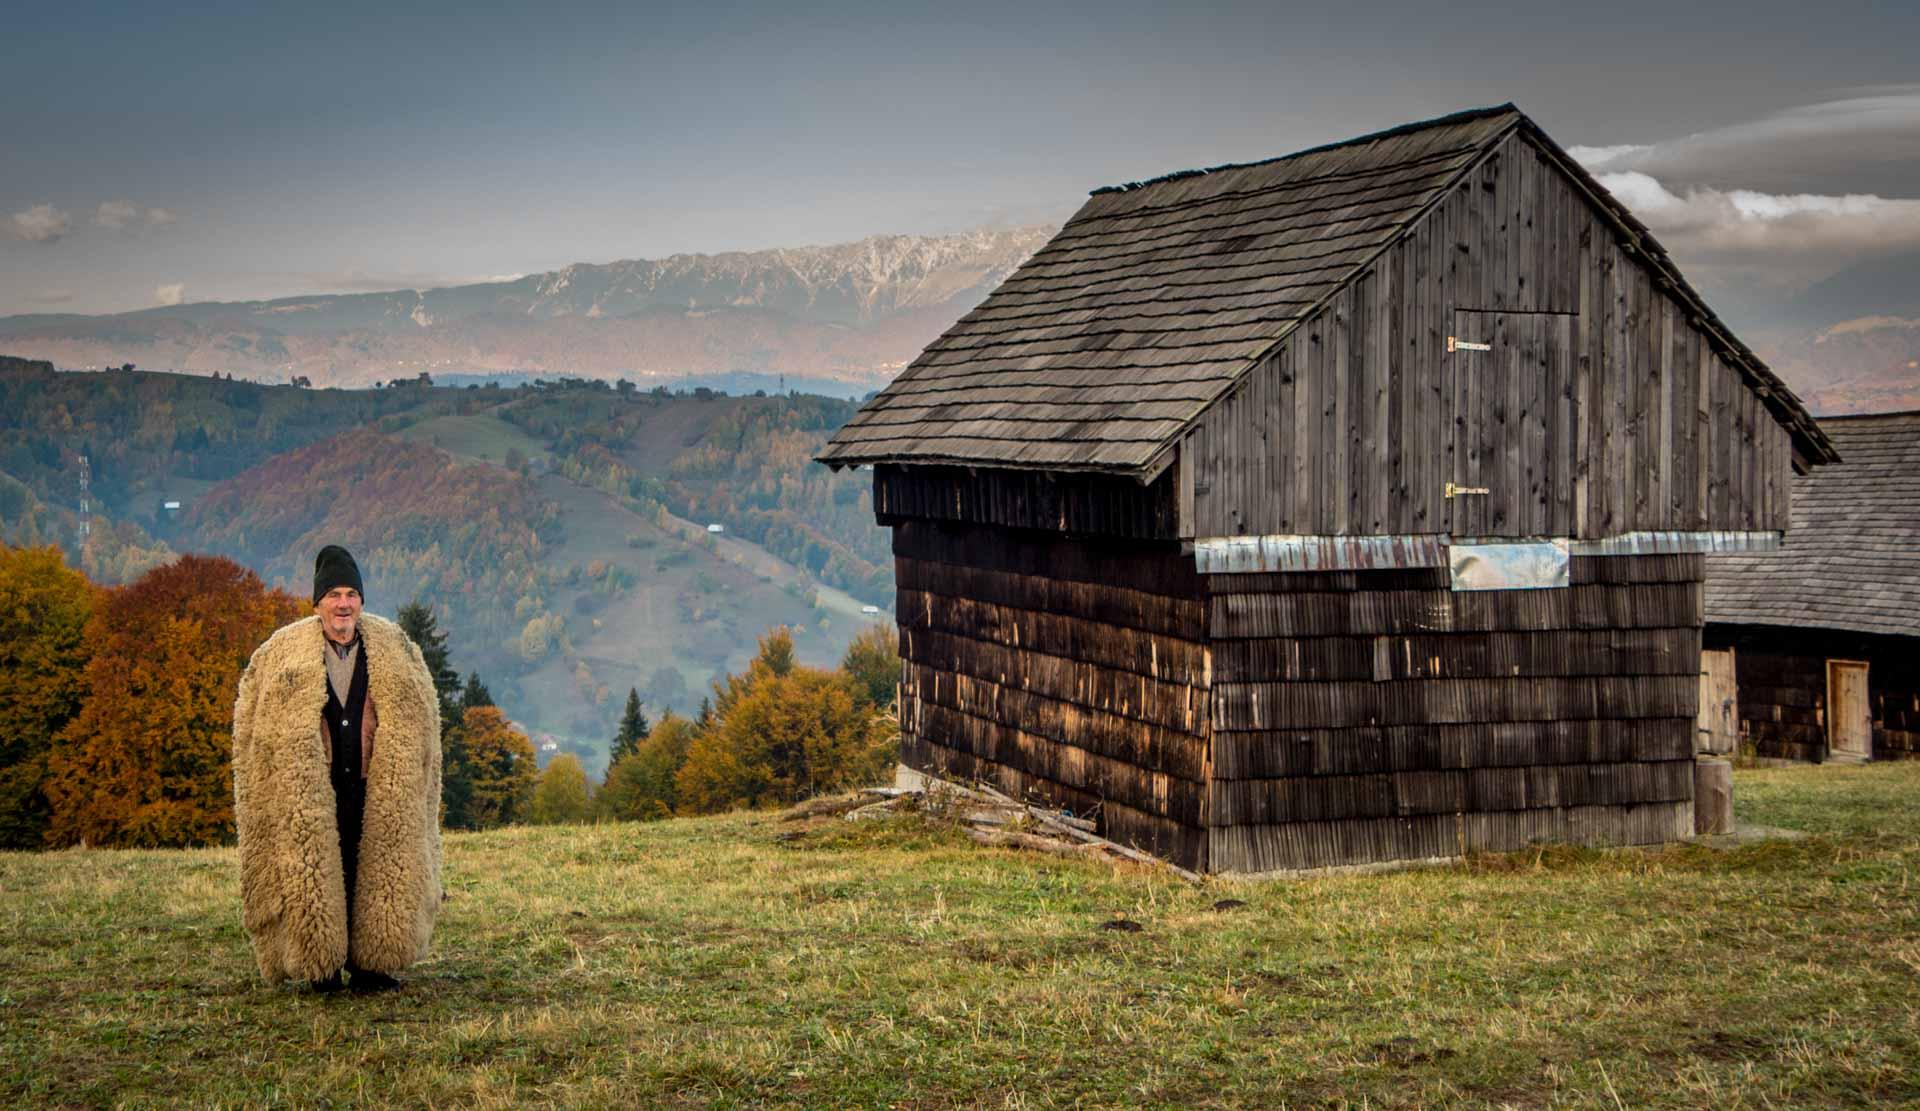 Shepherd in the Carpathian Mountains